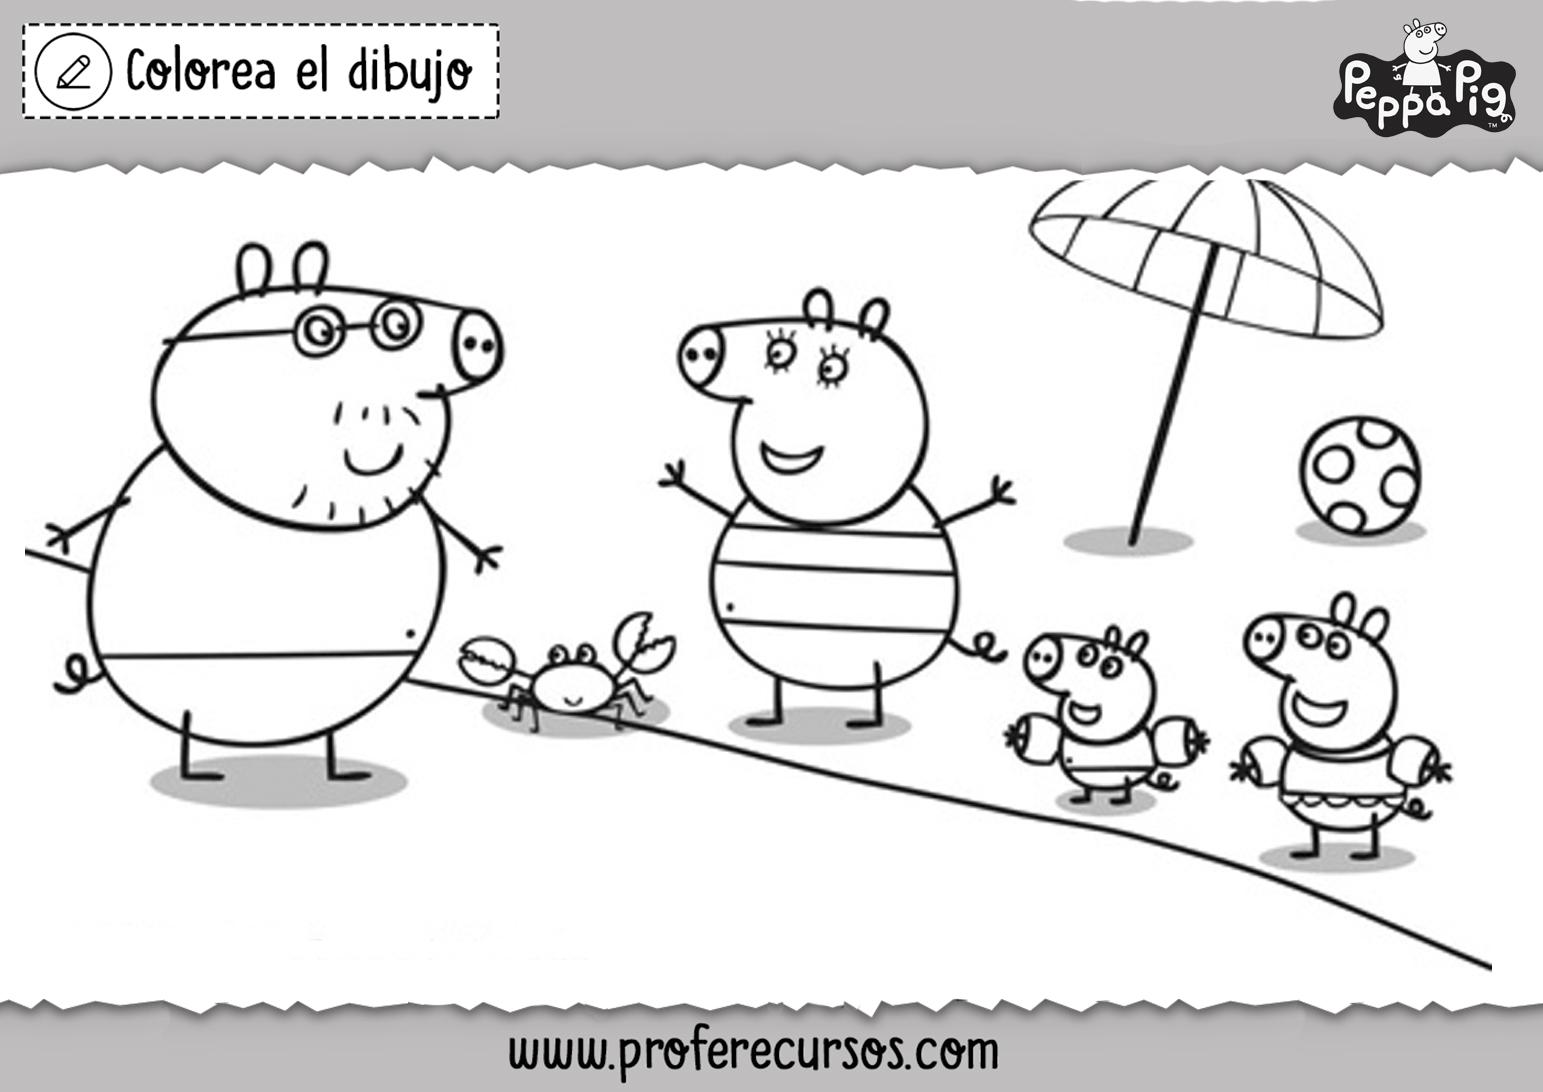 Imprimir Peppa Pig para Colorear